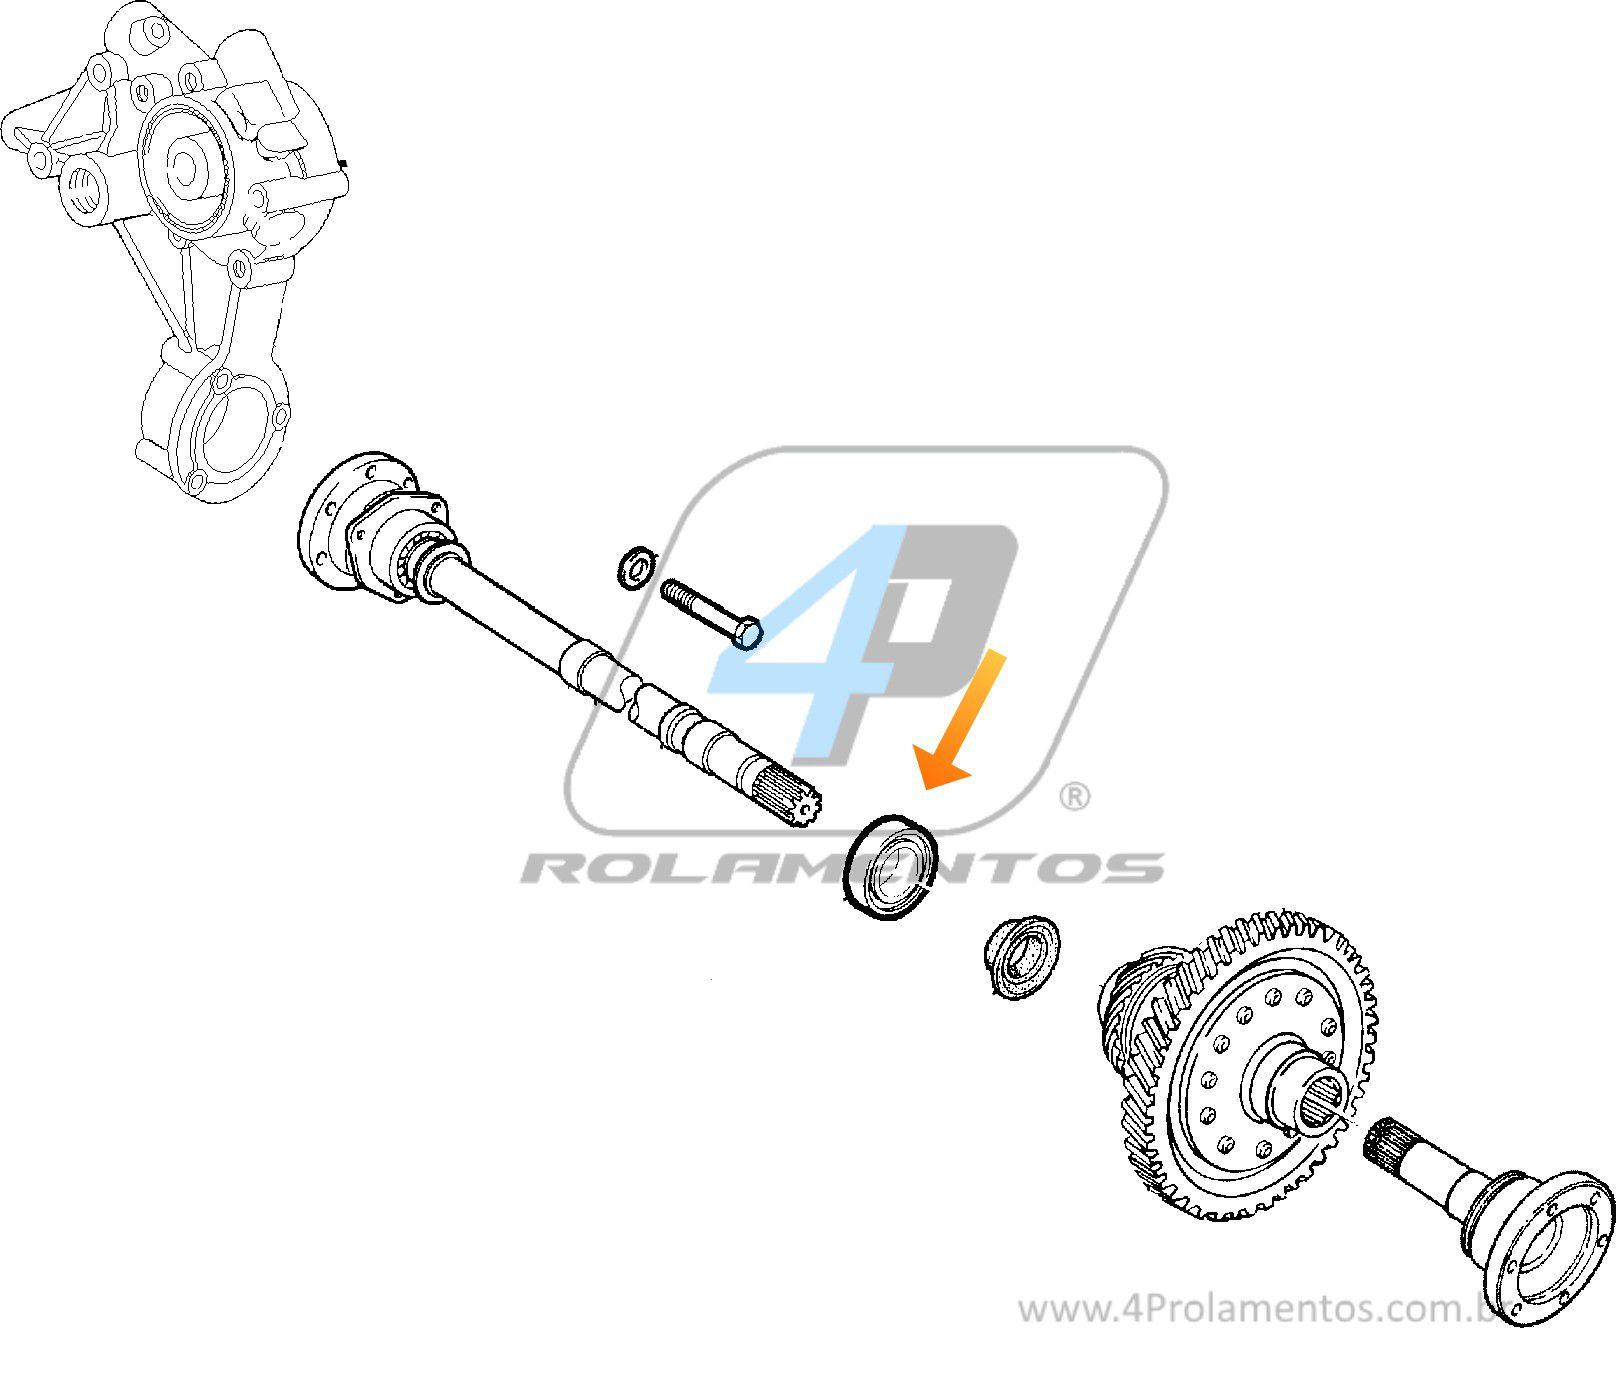 Rolamento de semi-eixo Alfa Romeo 164 1987 até 1998, intermediario